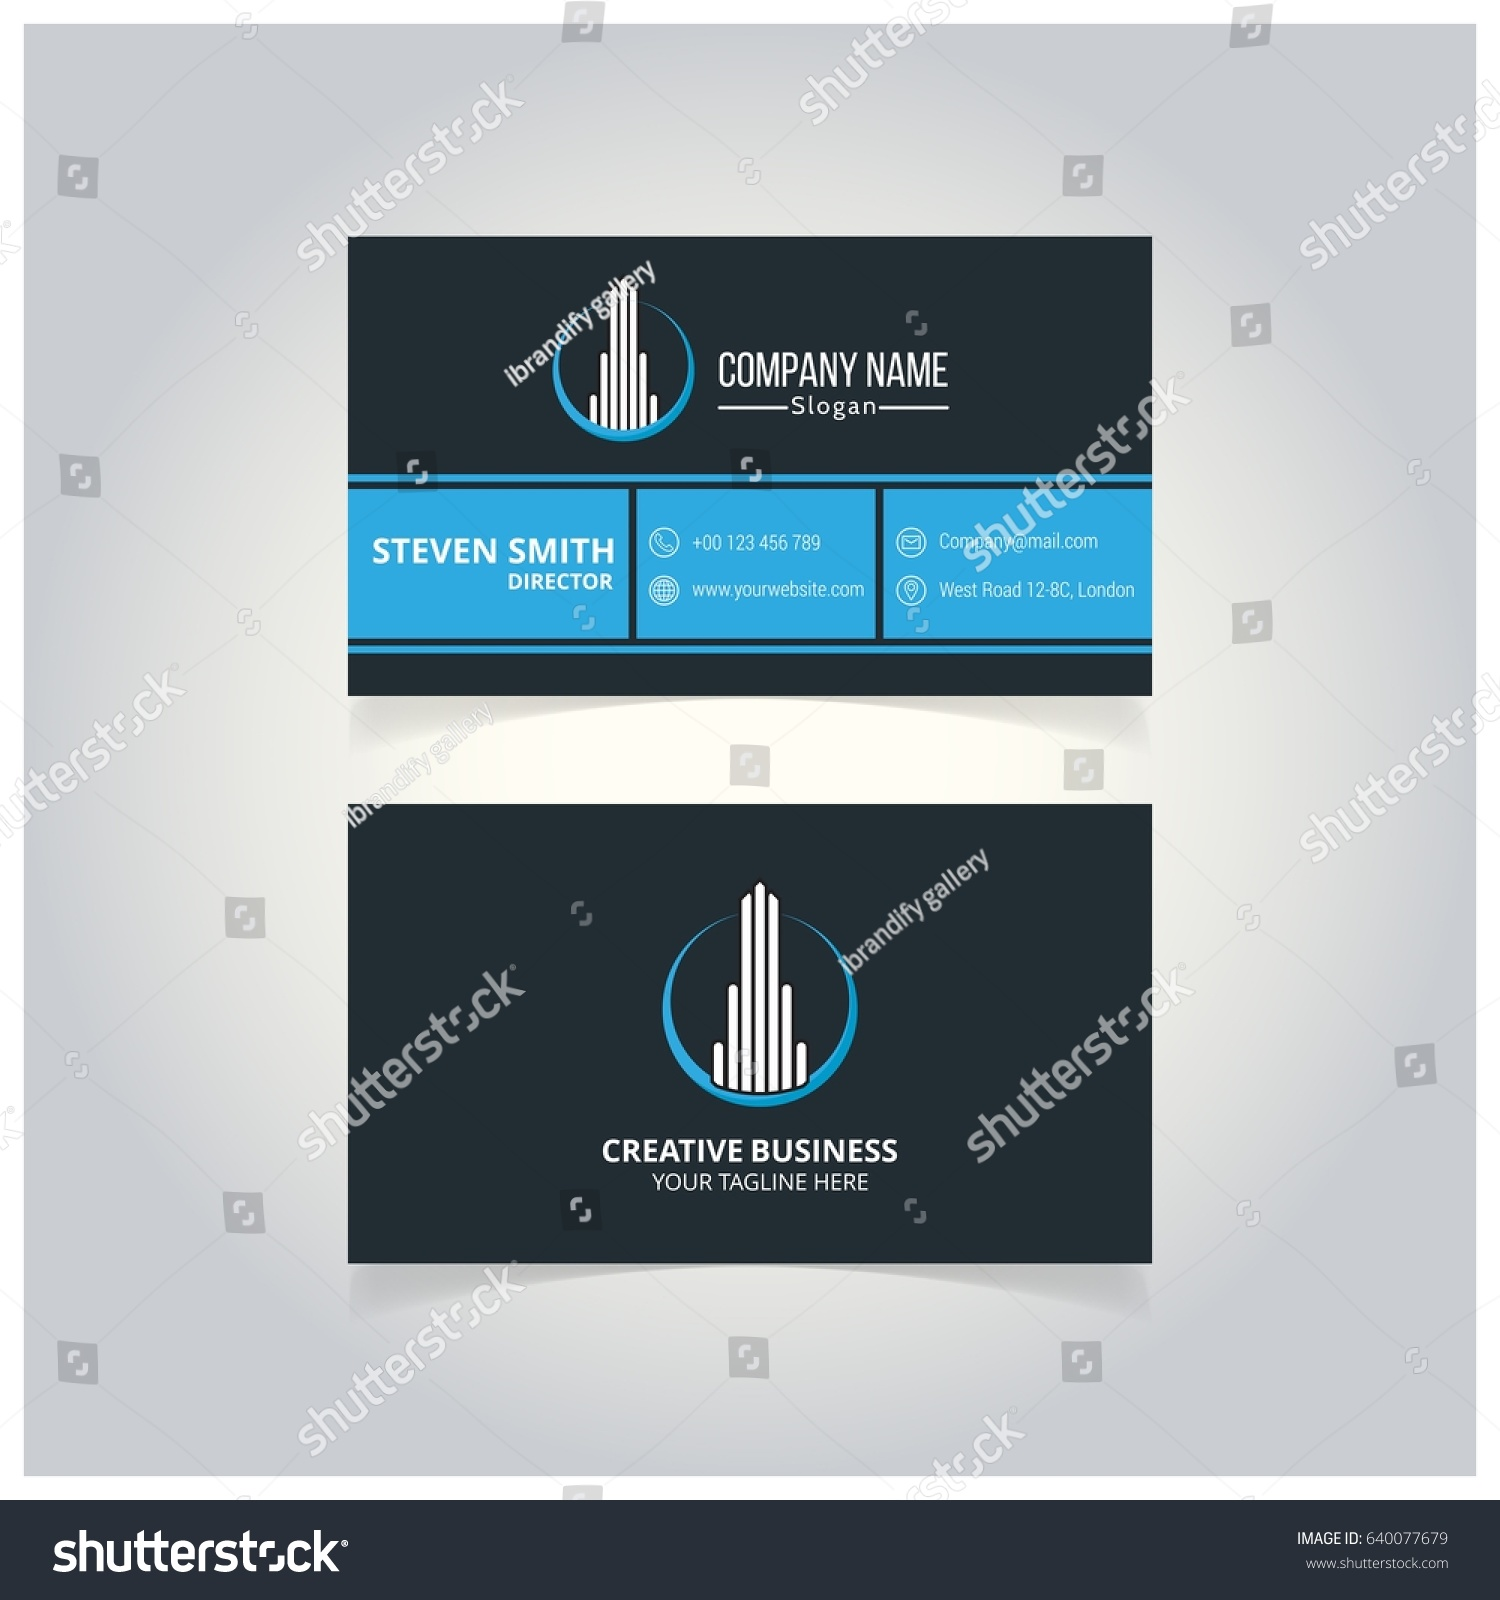 Building Logo Minimal Corporate Business Card Stock Photo (Photo ...